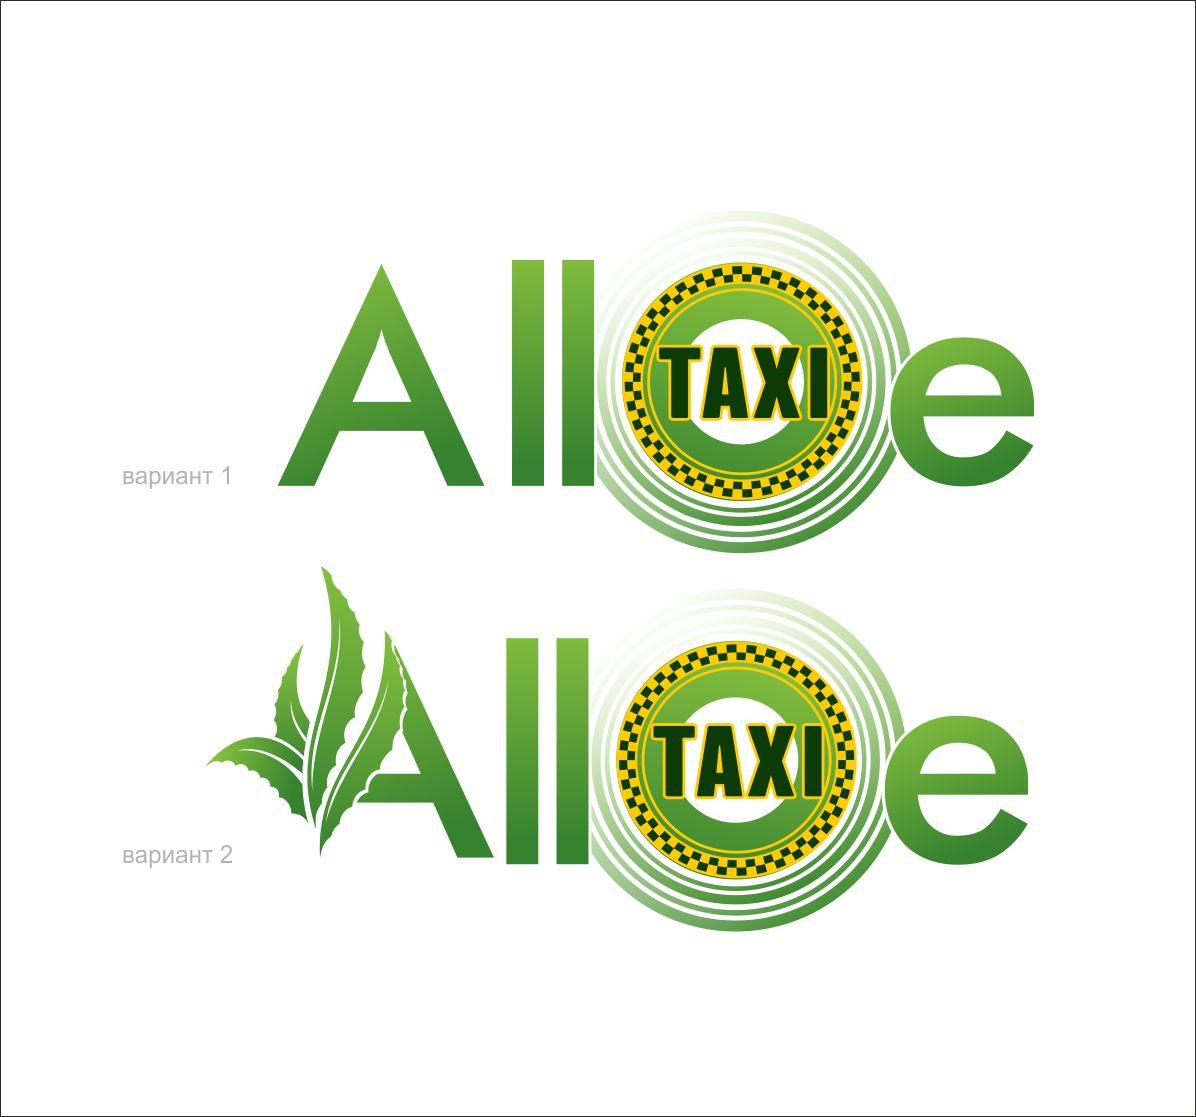 придумать логотип для такси фото f_821539c0926903cd.jpg